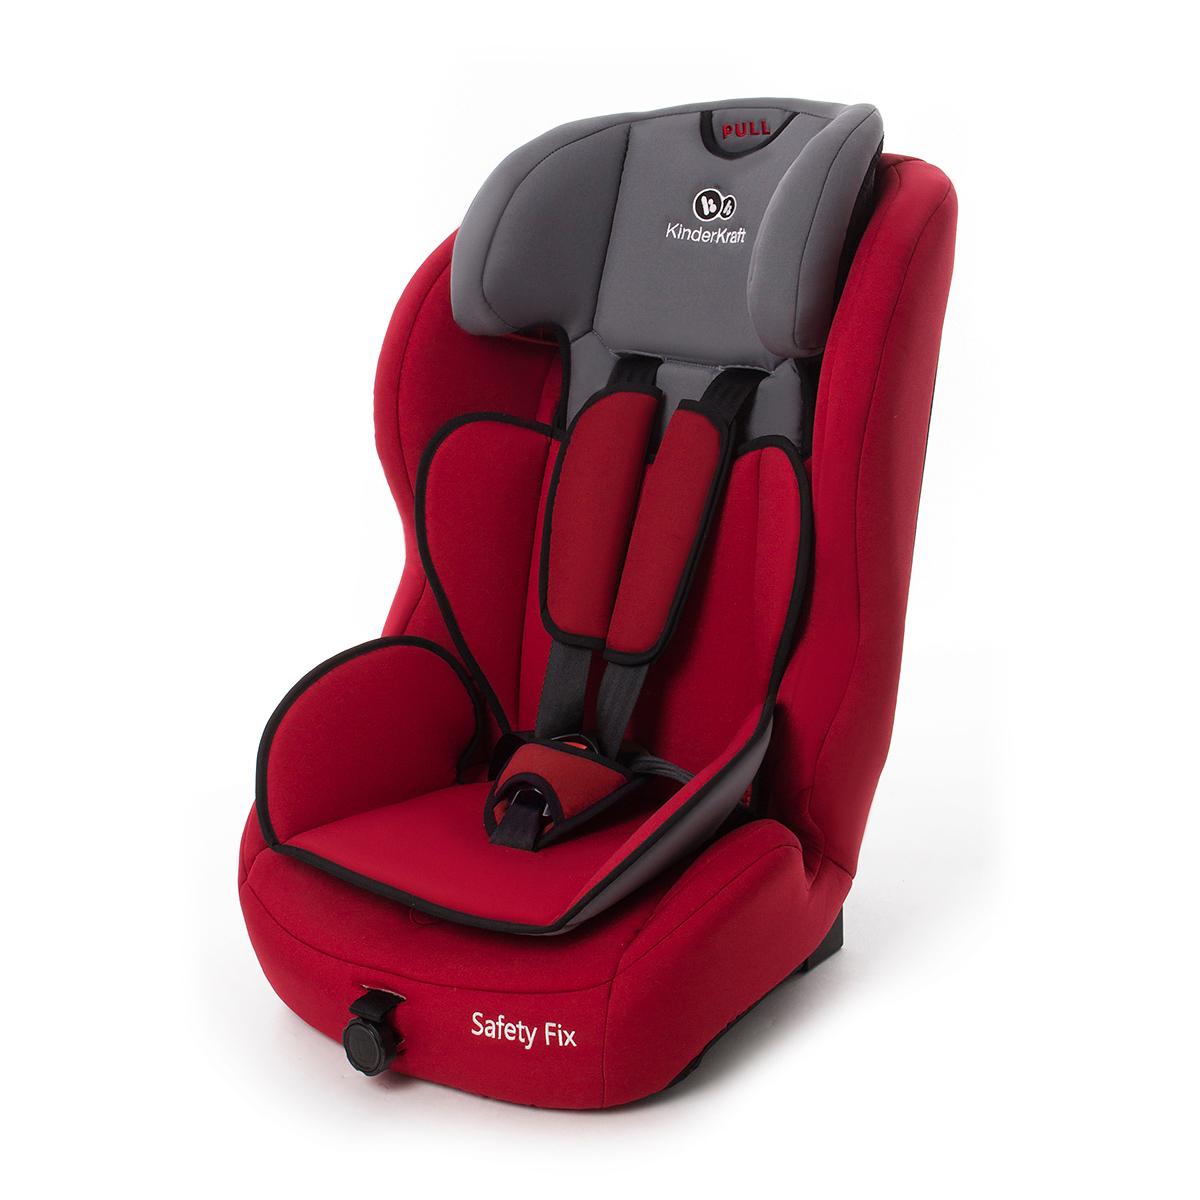 Kinderkraft safetyfix isofix si ge voiture pour b b for Chaise enfant voiture